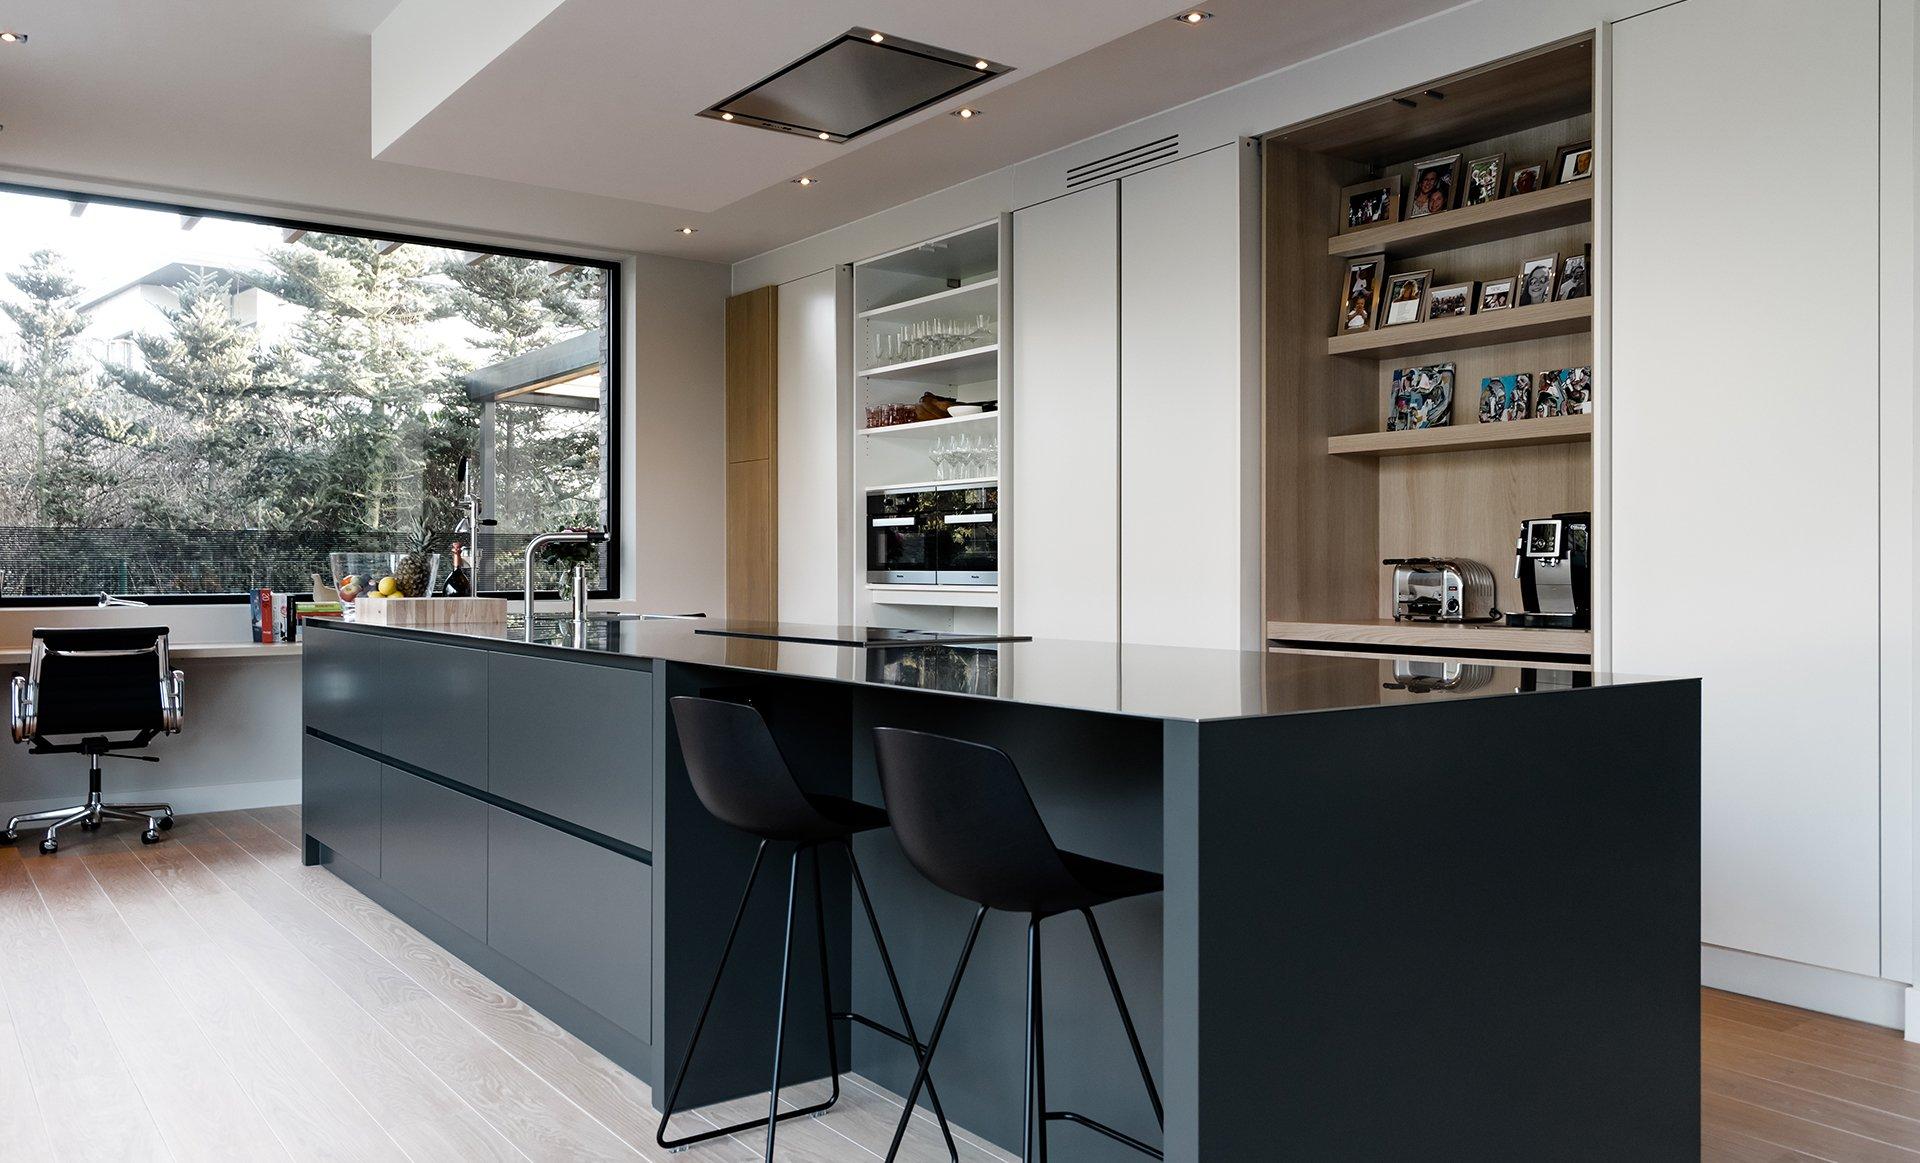 G-Design: keukens & interieur op maat.